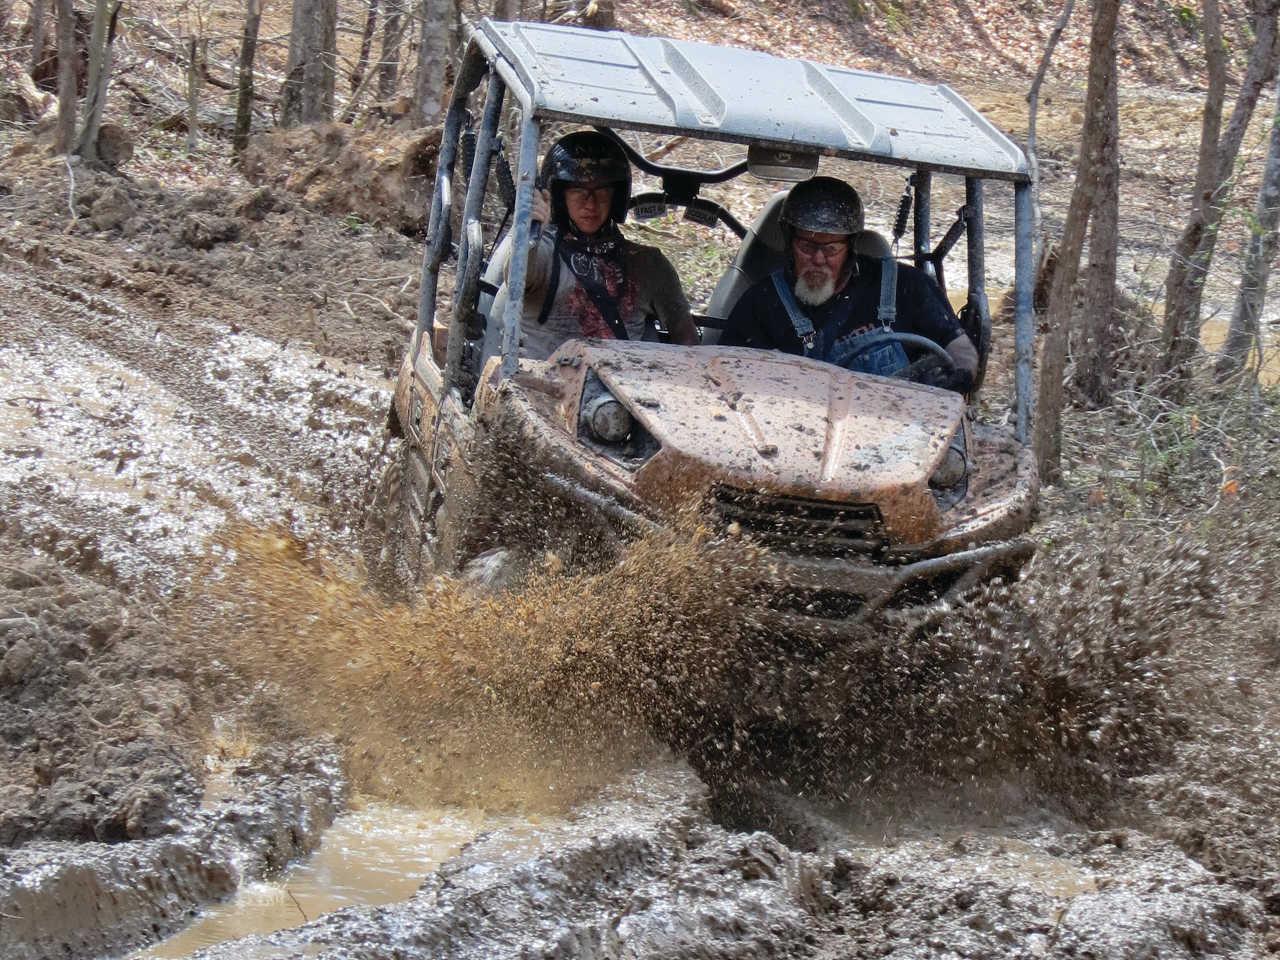 location.2014.rush-off-road-park.kentucky.side-x-side.riding.through-mud.jpg